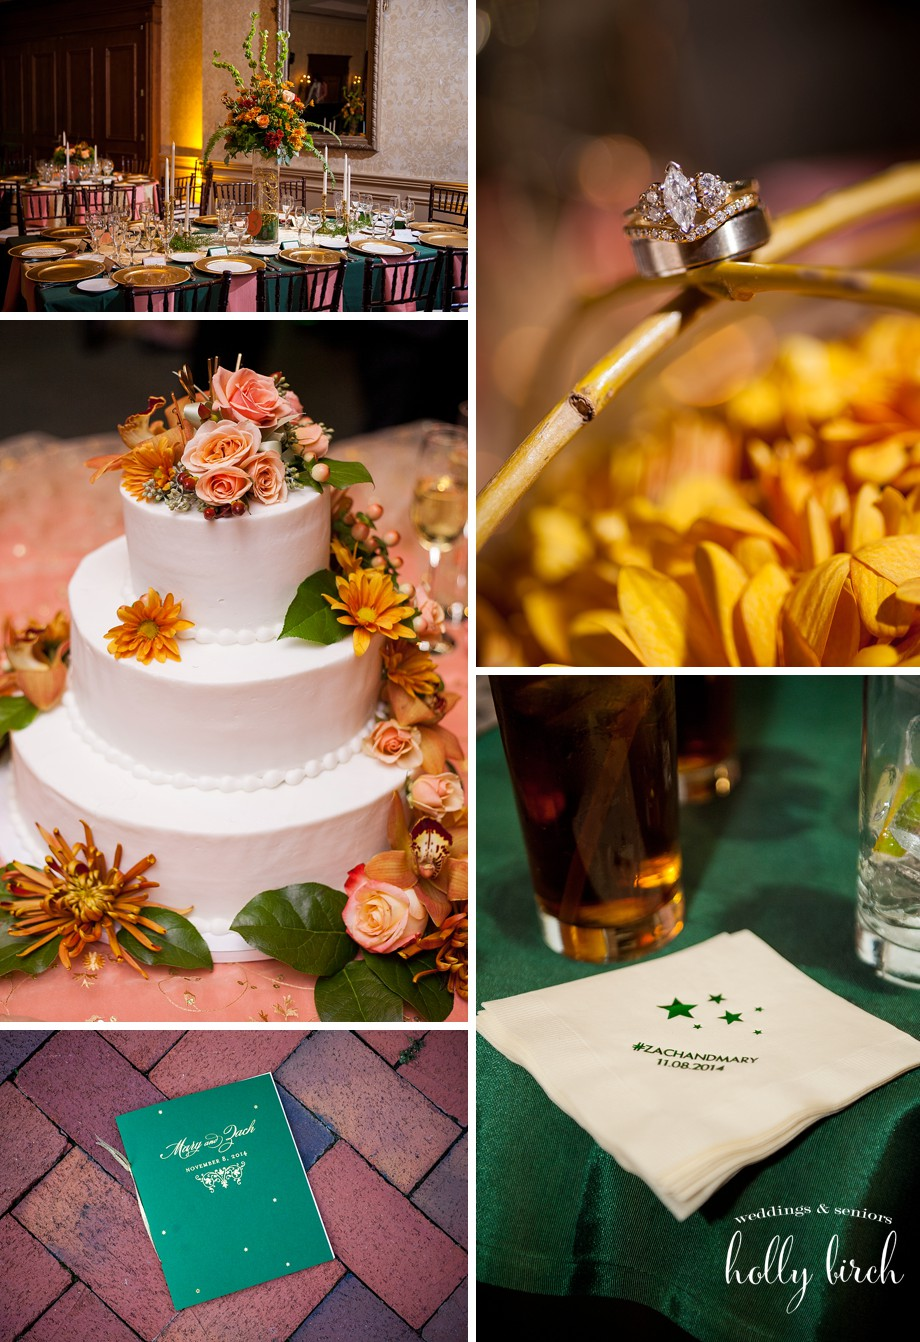 cake reception details